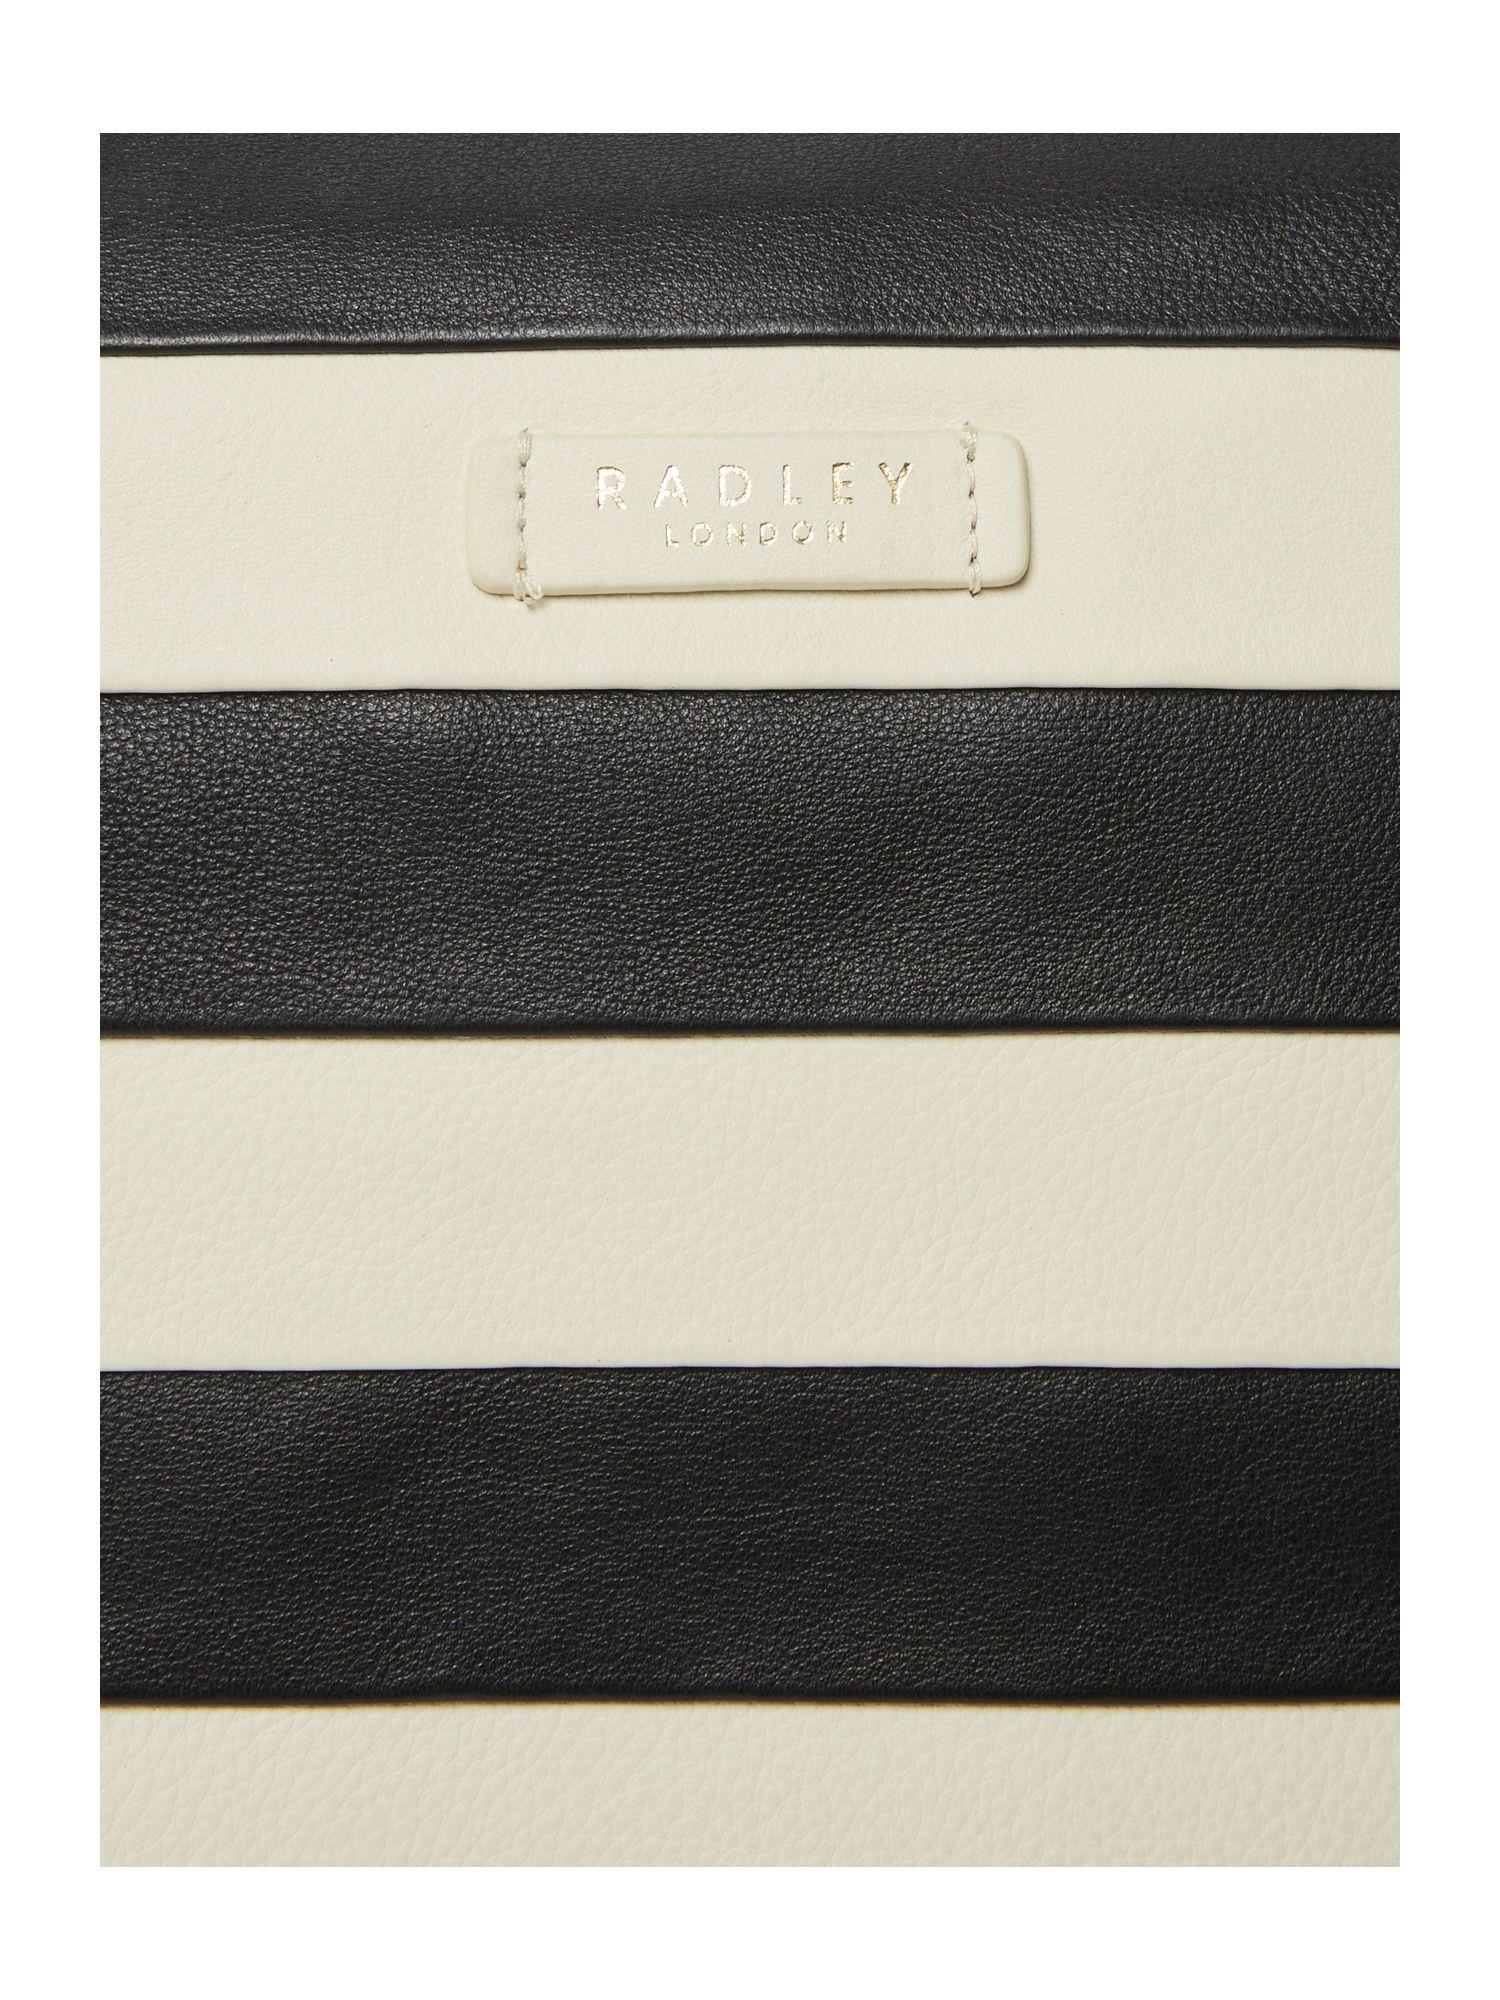 Radley Leather Putney Black Large Ziptop Cross Body